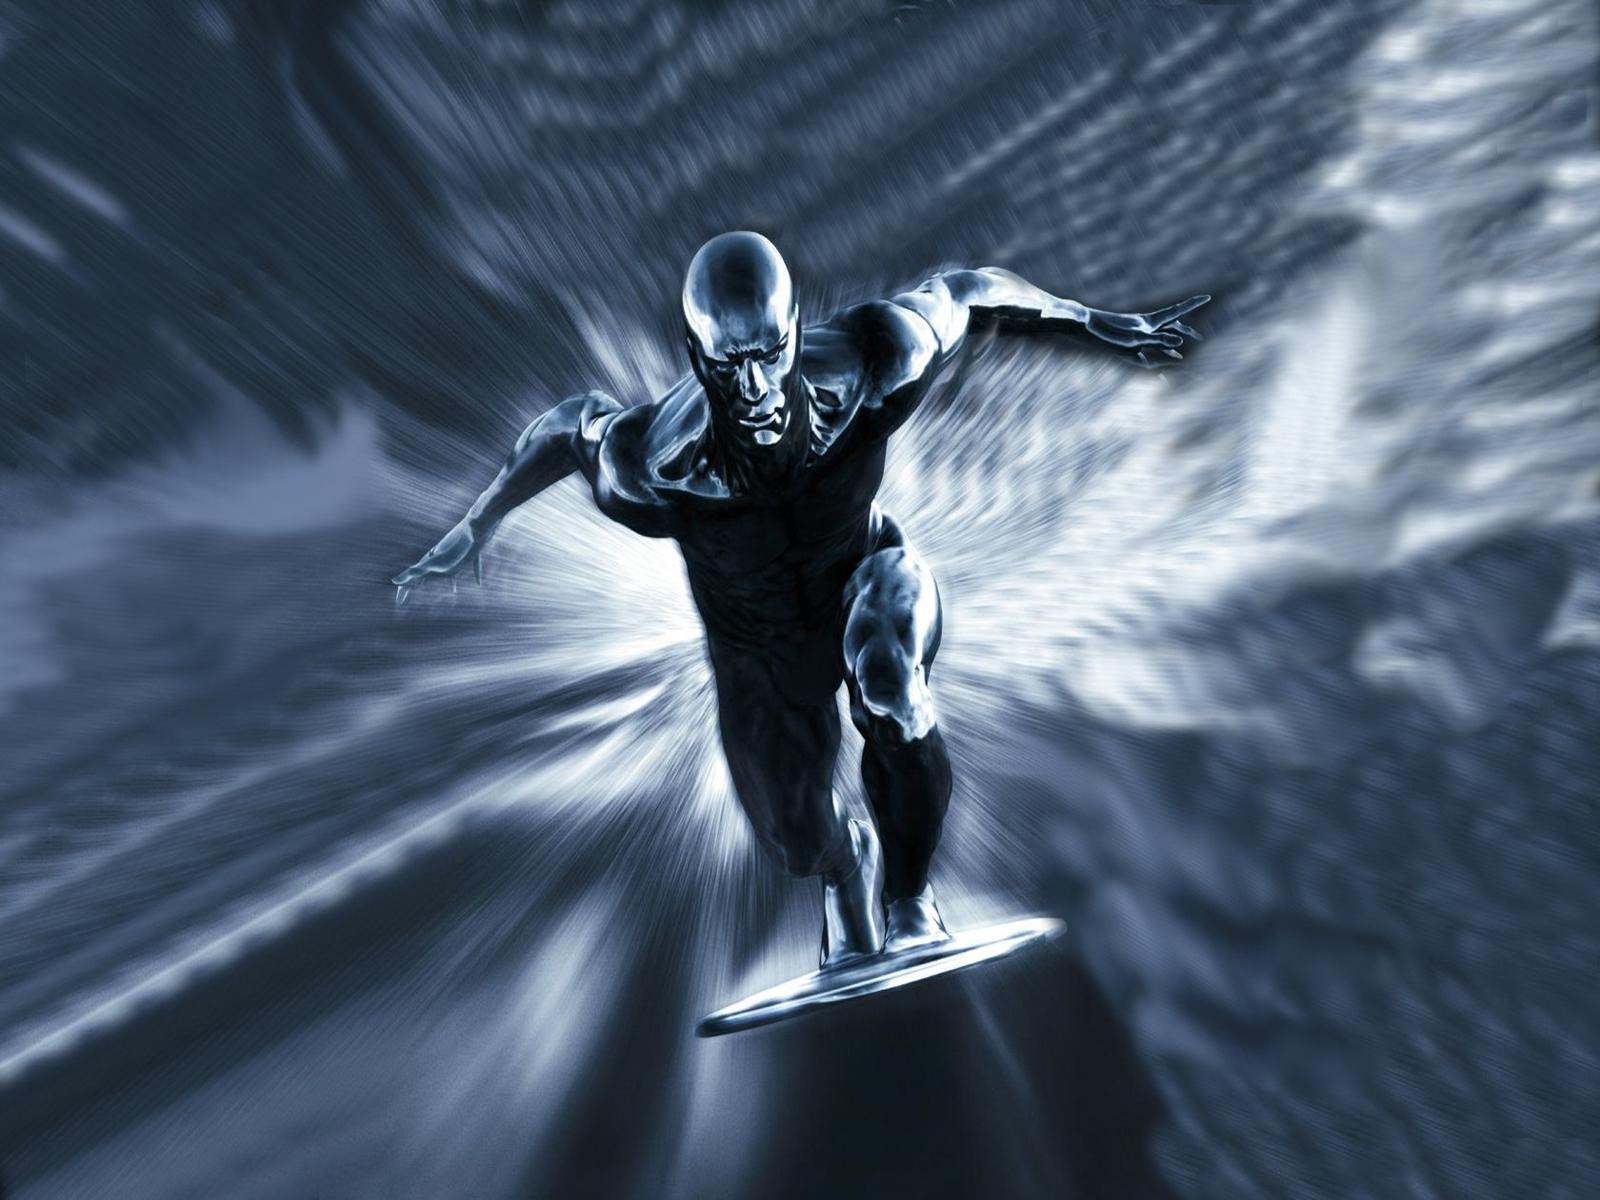 Silver Hd Wallpaper: Silver Surfer Wallpaper HD